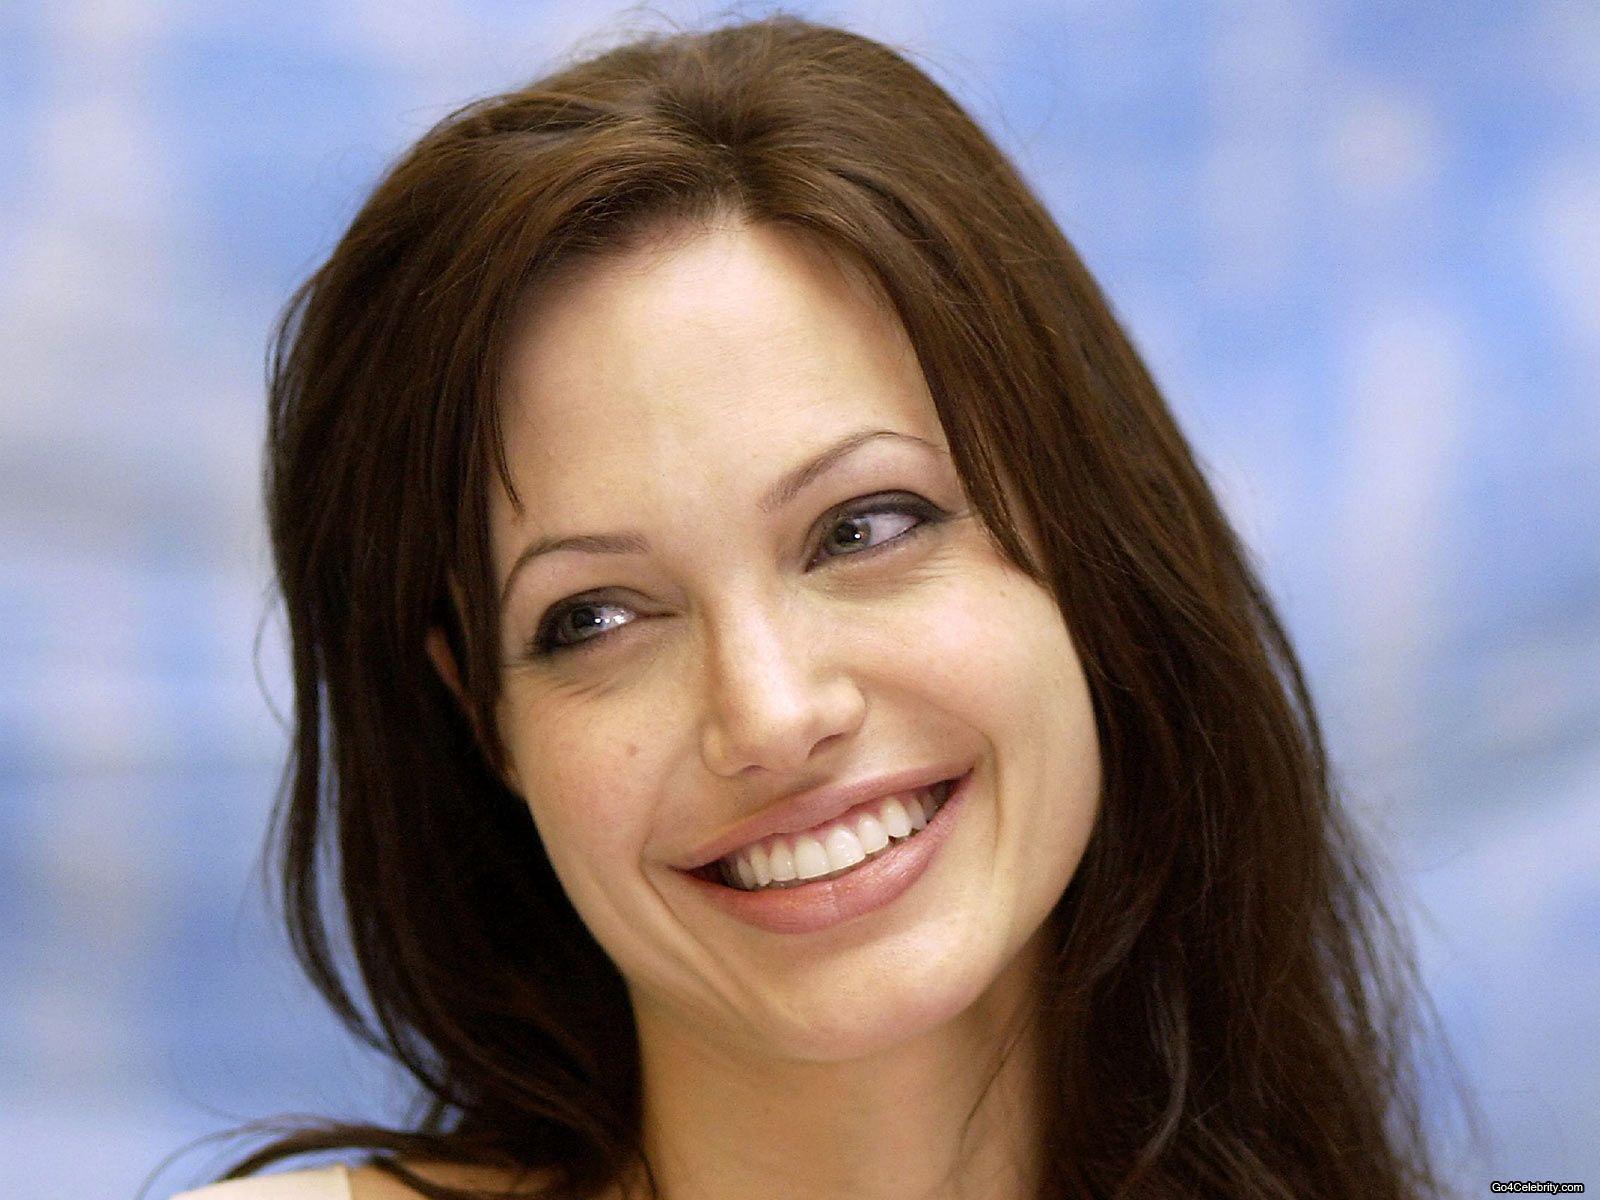 http://1.bp.blogspot.com/-B9g0TRG68tc/UBTkVVJGm0I/AAAAAAAAMac/RmEyW8XrbbY/s1600/Angelina-Jolie-127.jpg